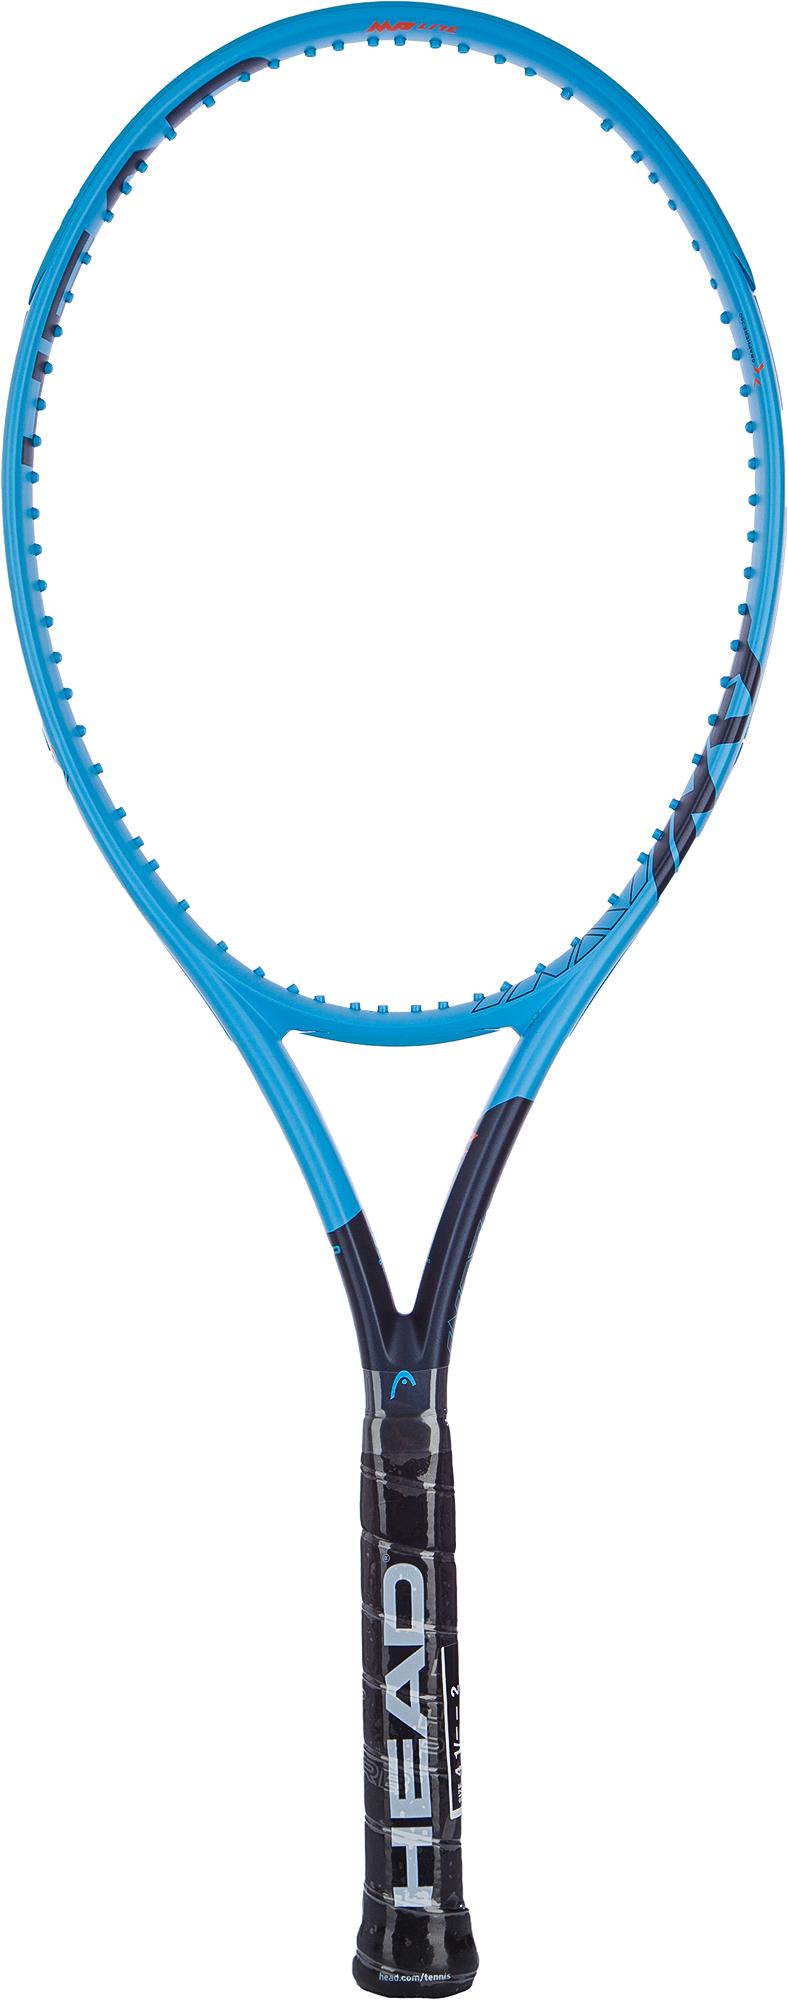 Head Ракетка для большого тенниса Head Graphene 360 Instinct MP LITE 27